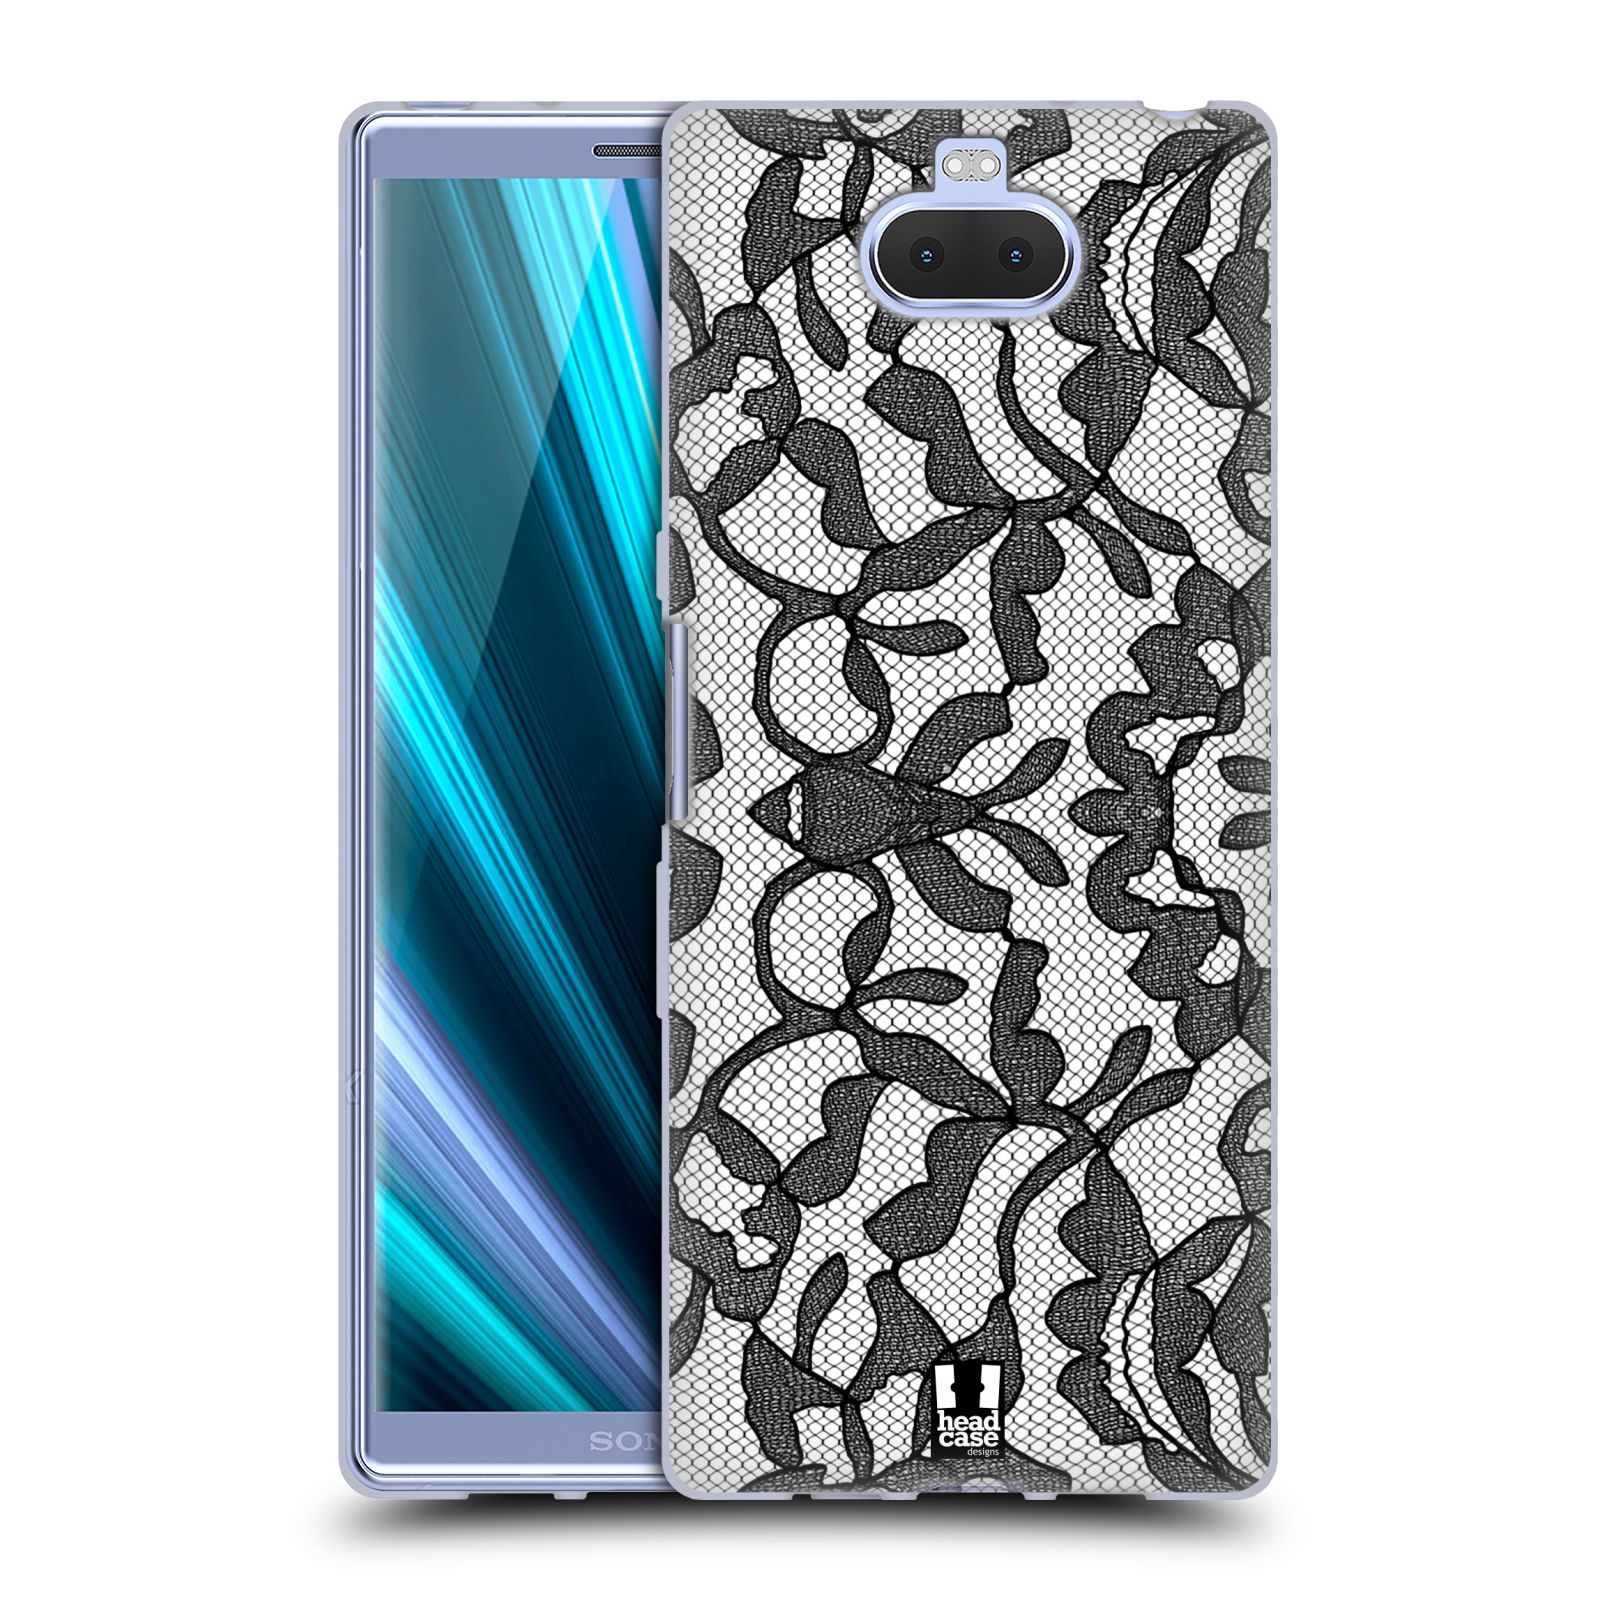 Silikonové pouzdro na mobil Sony Xperia 10 Plus - Head Case - LEAFY KRAJKA